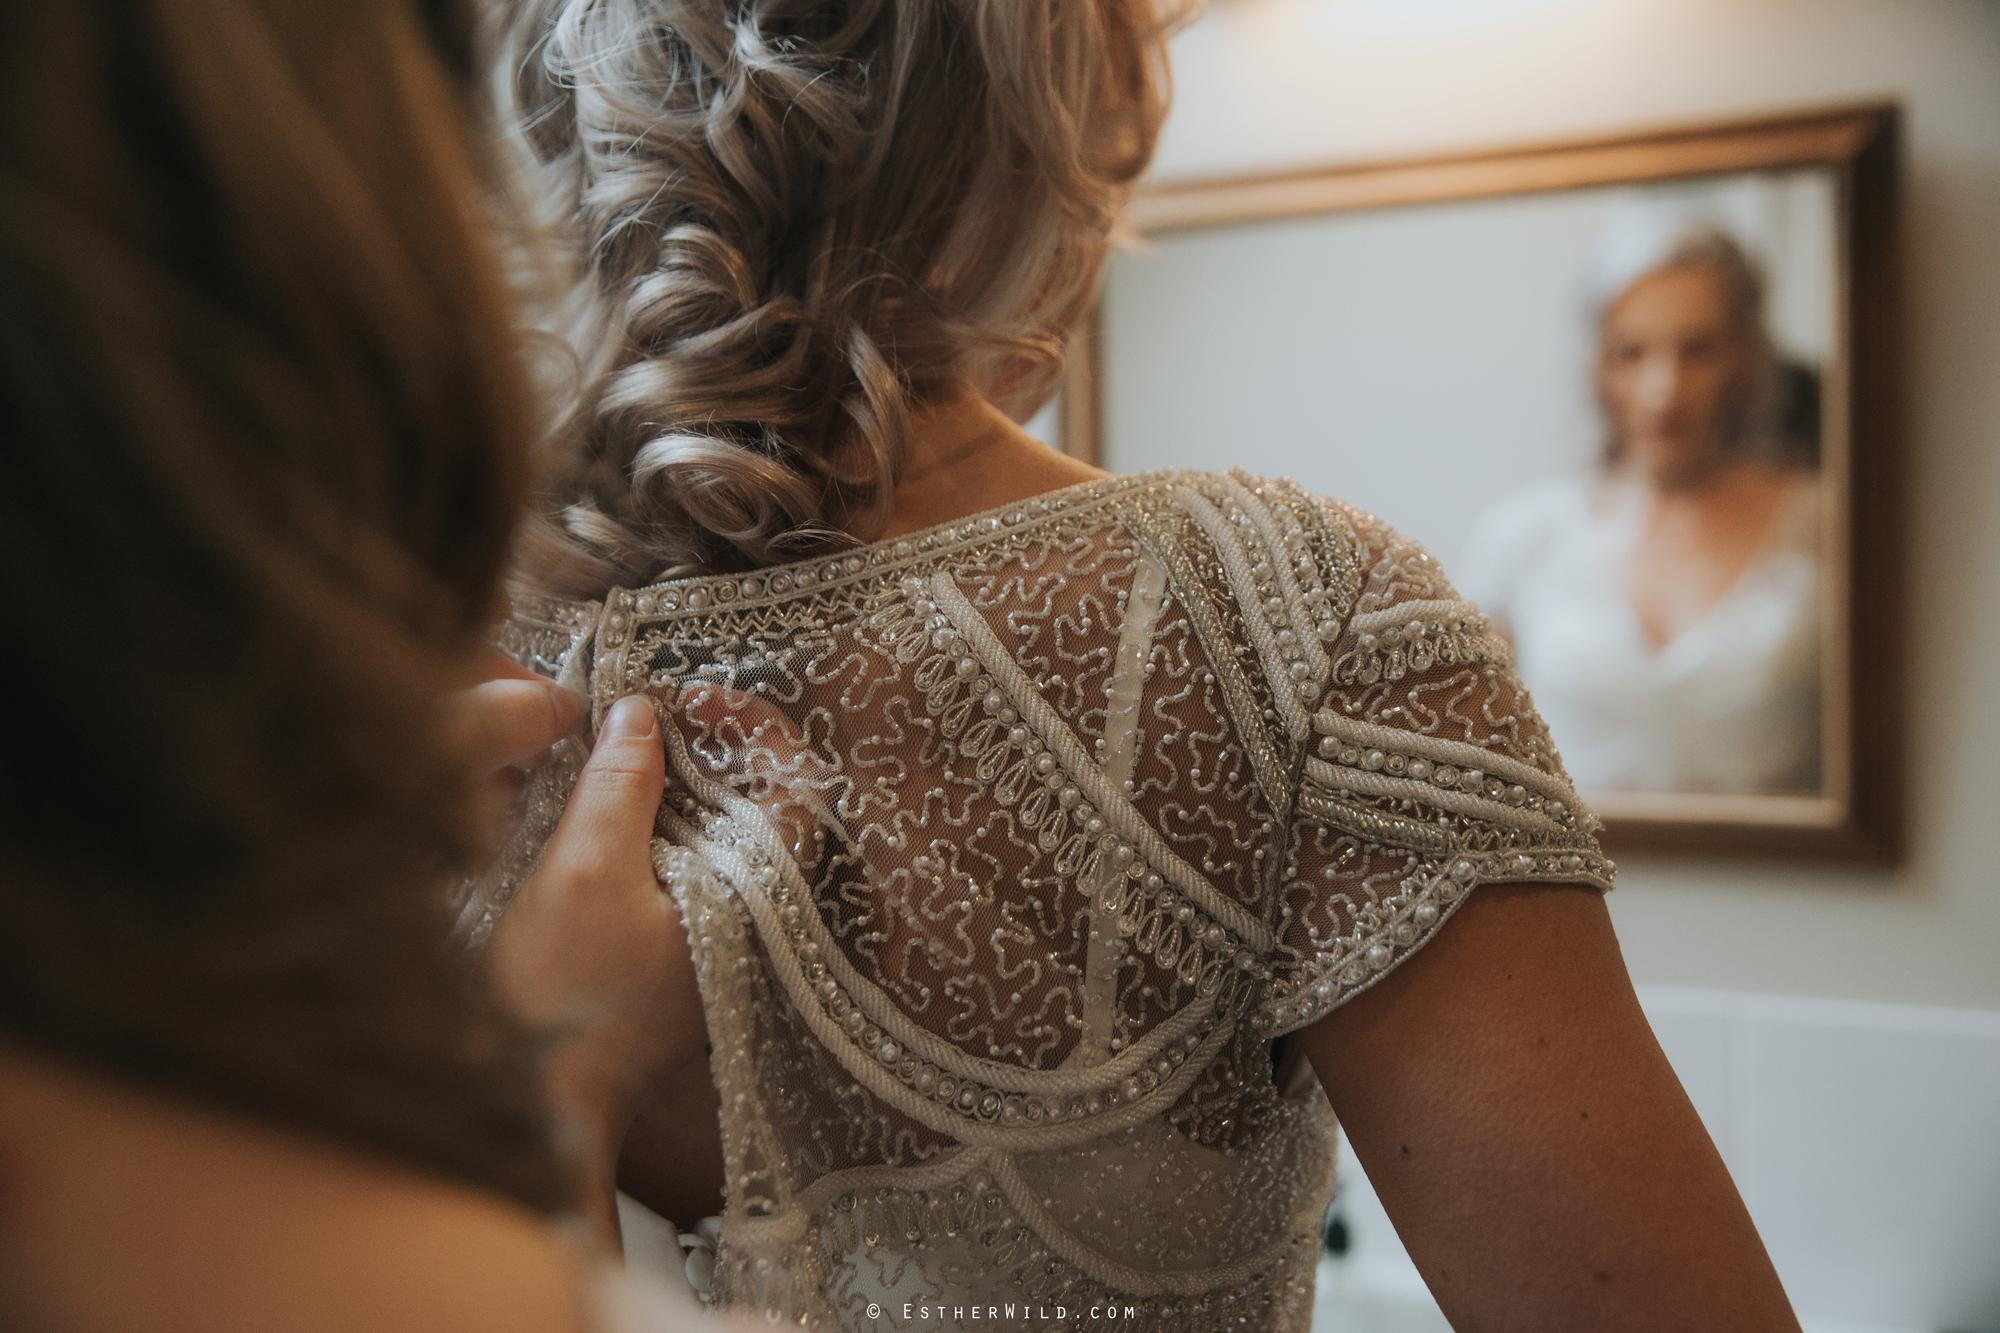 Elms_Barn_Weddings_Suffolk_Photographer_Copyright_Esther_Wild_IMG_0909.jpg